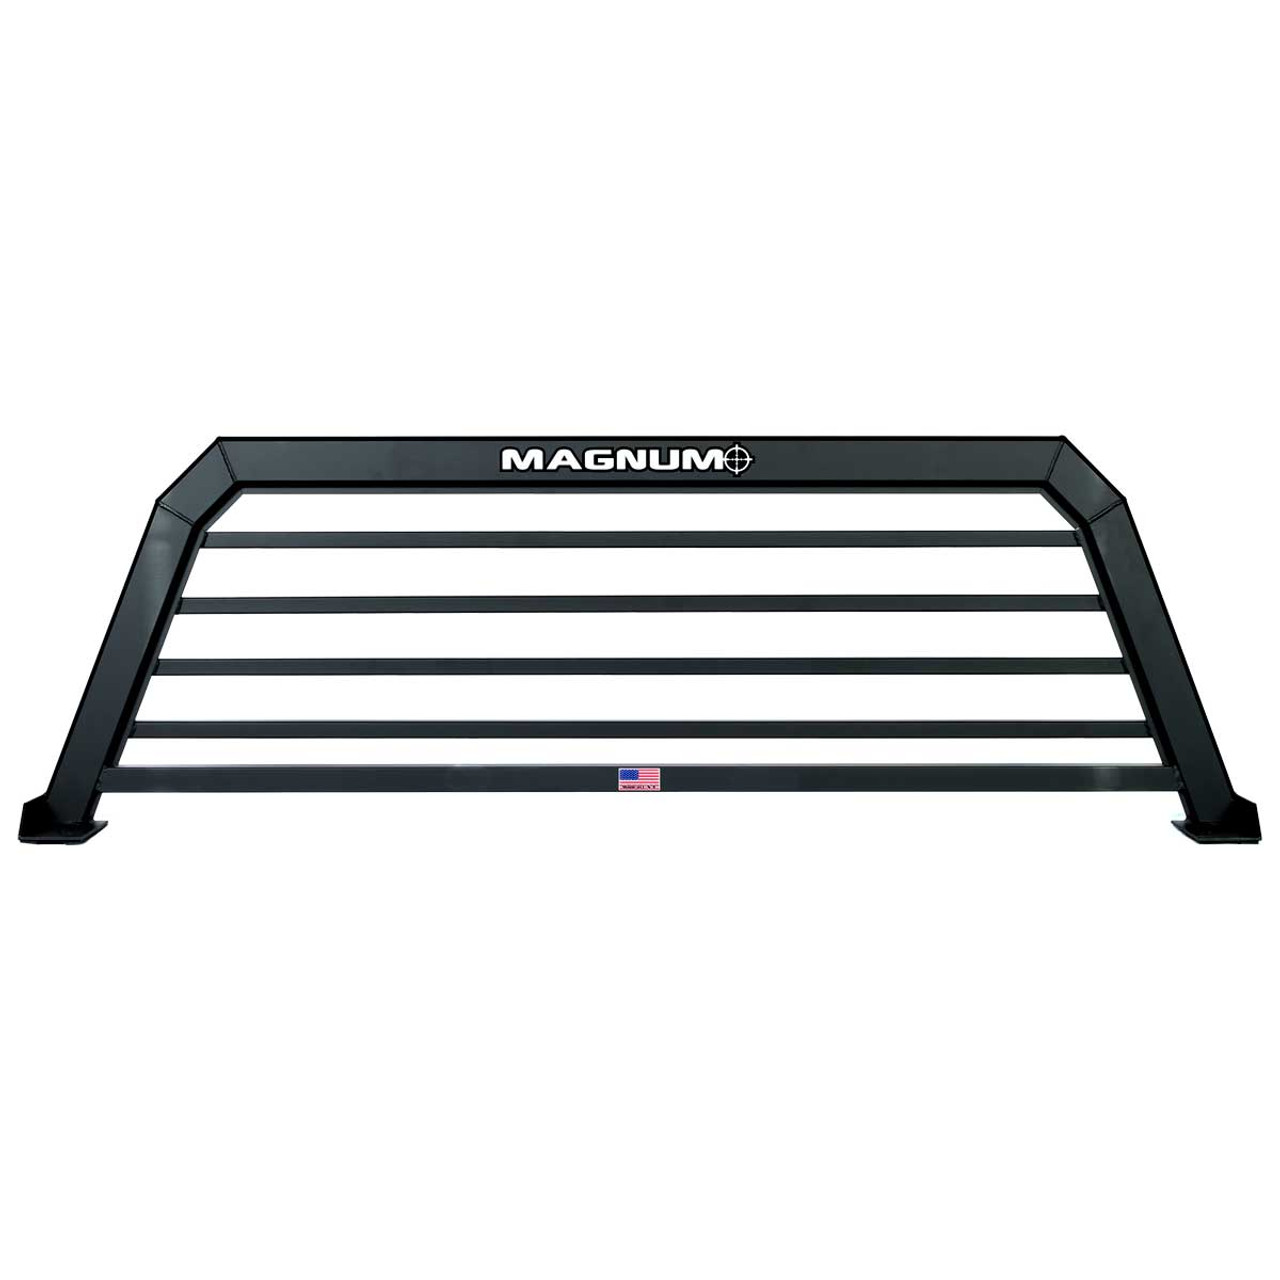 Truck Rack - Standard